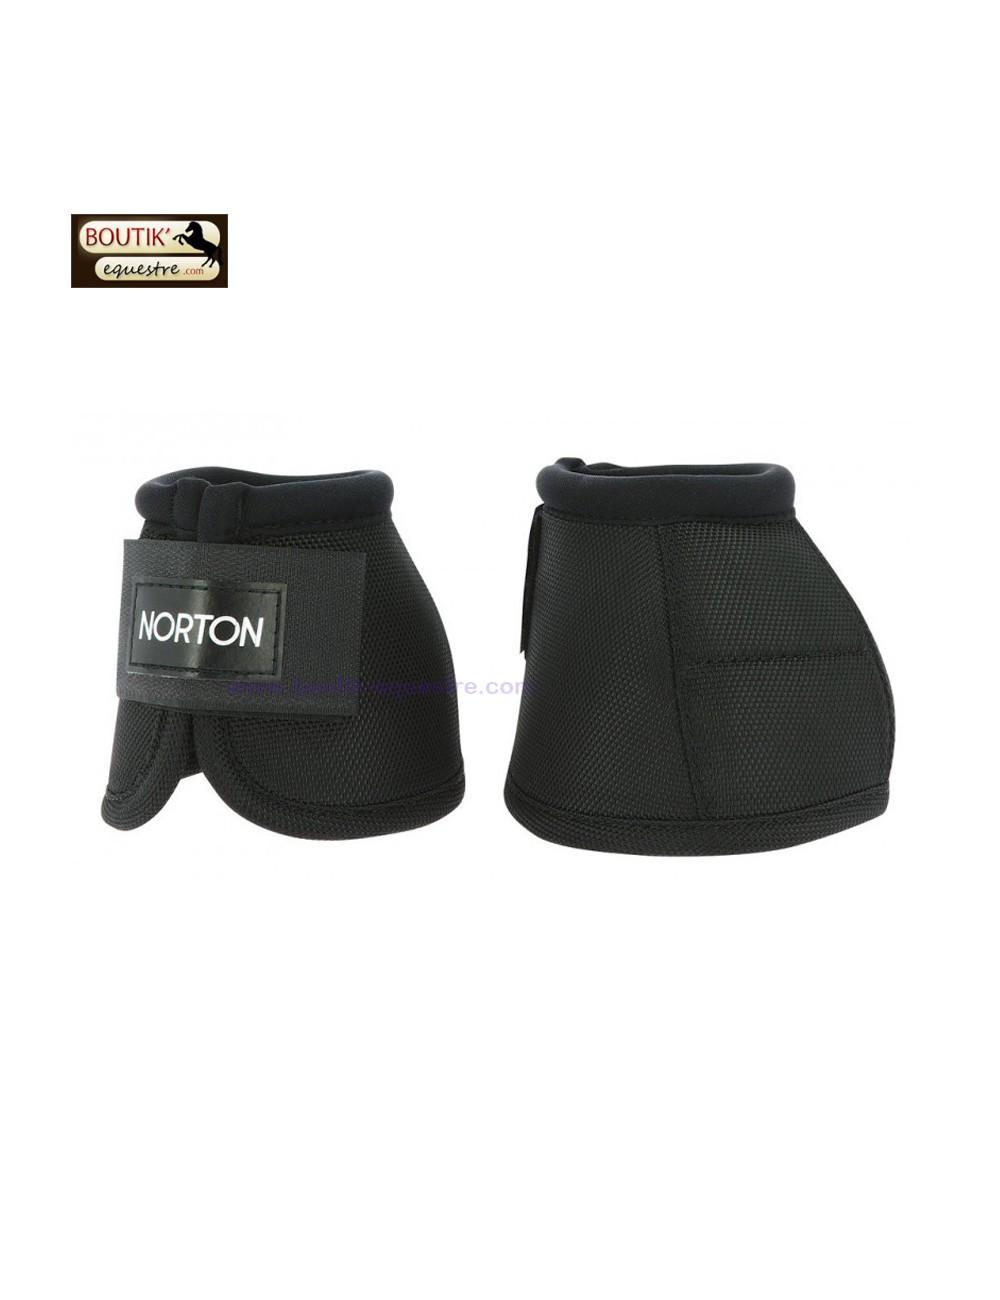 Cloches NORTON 2520 D